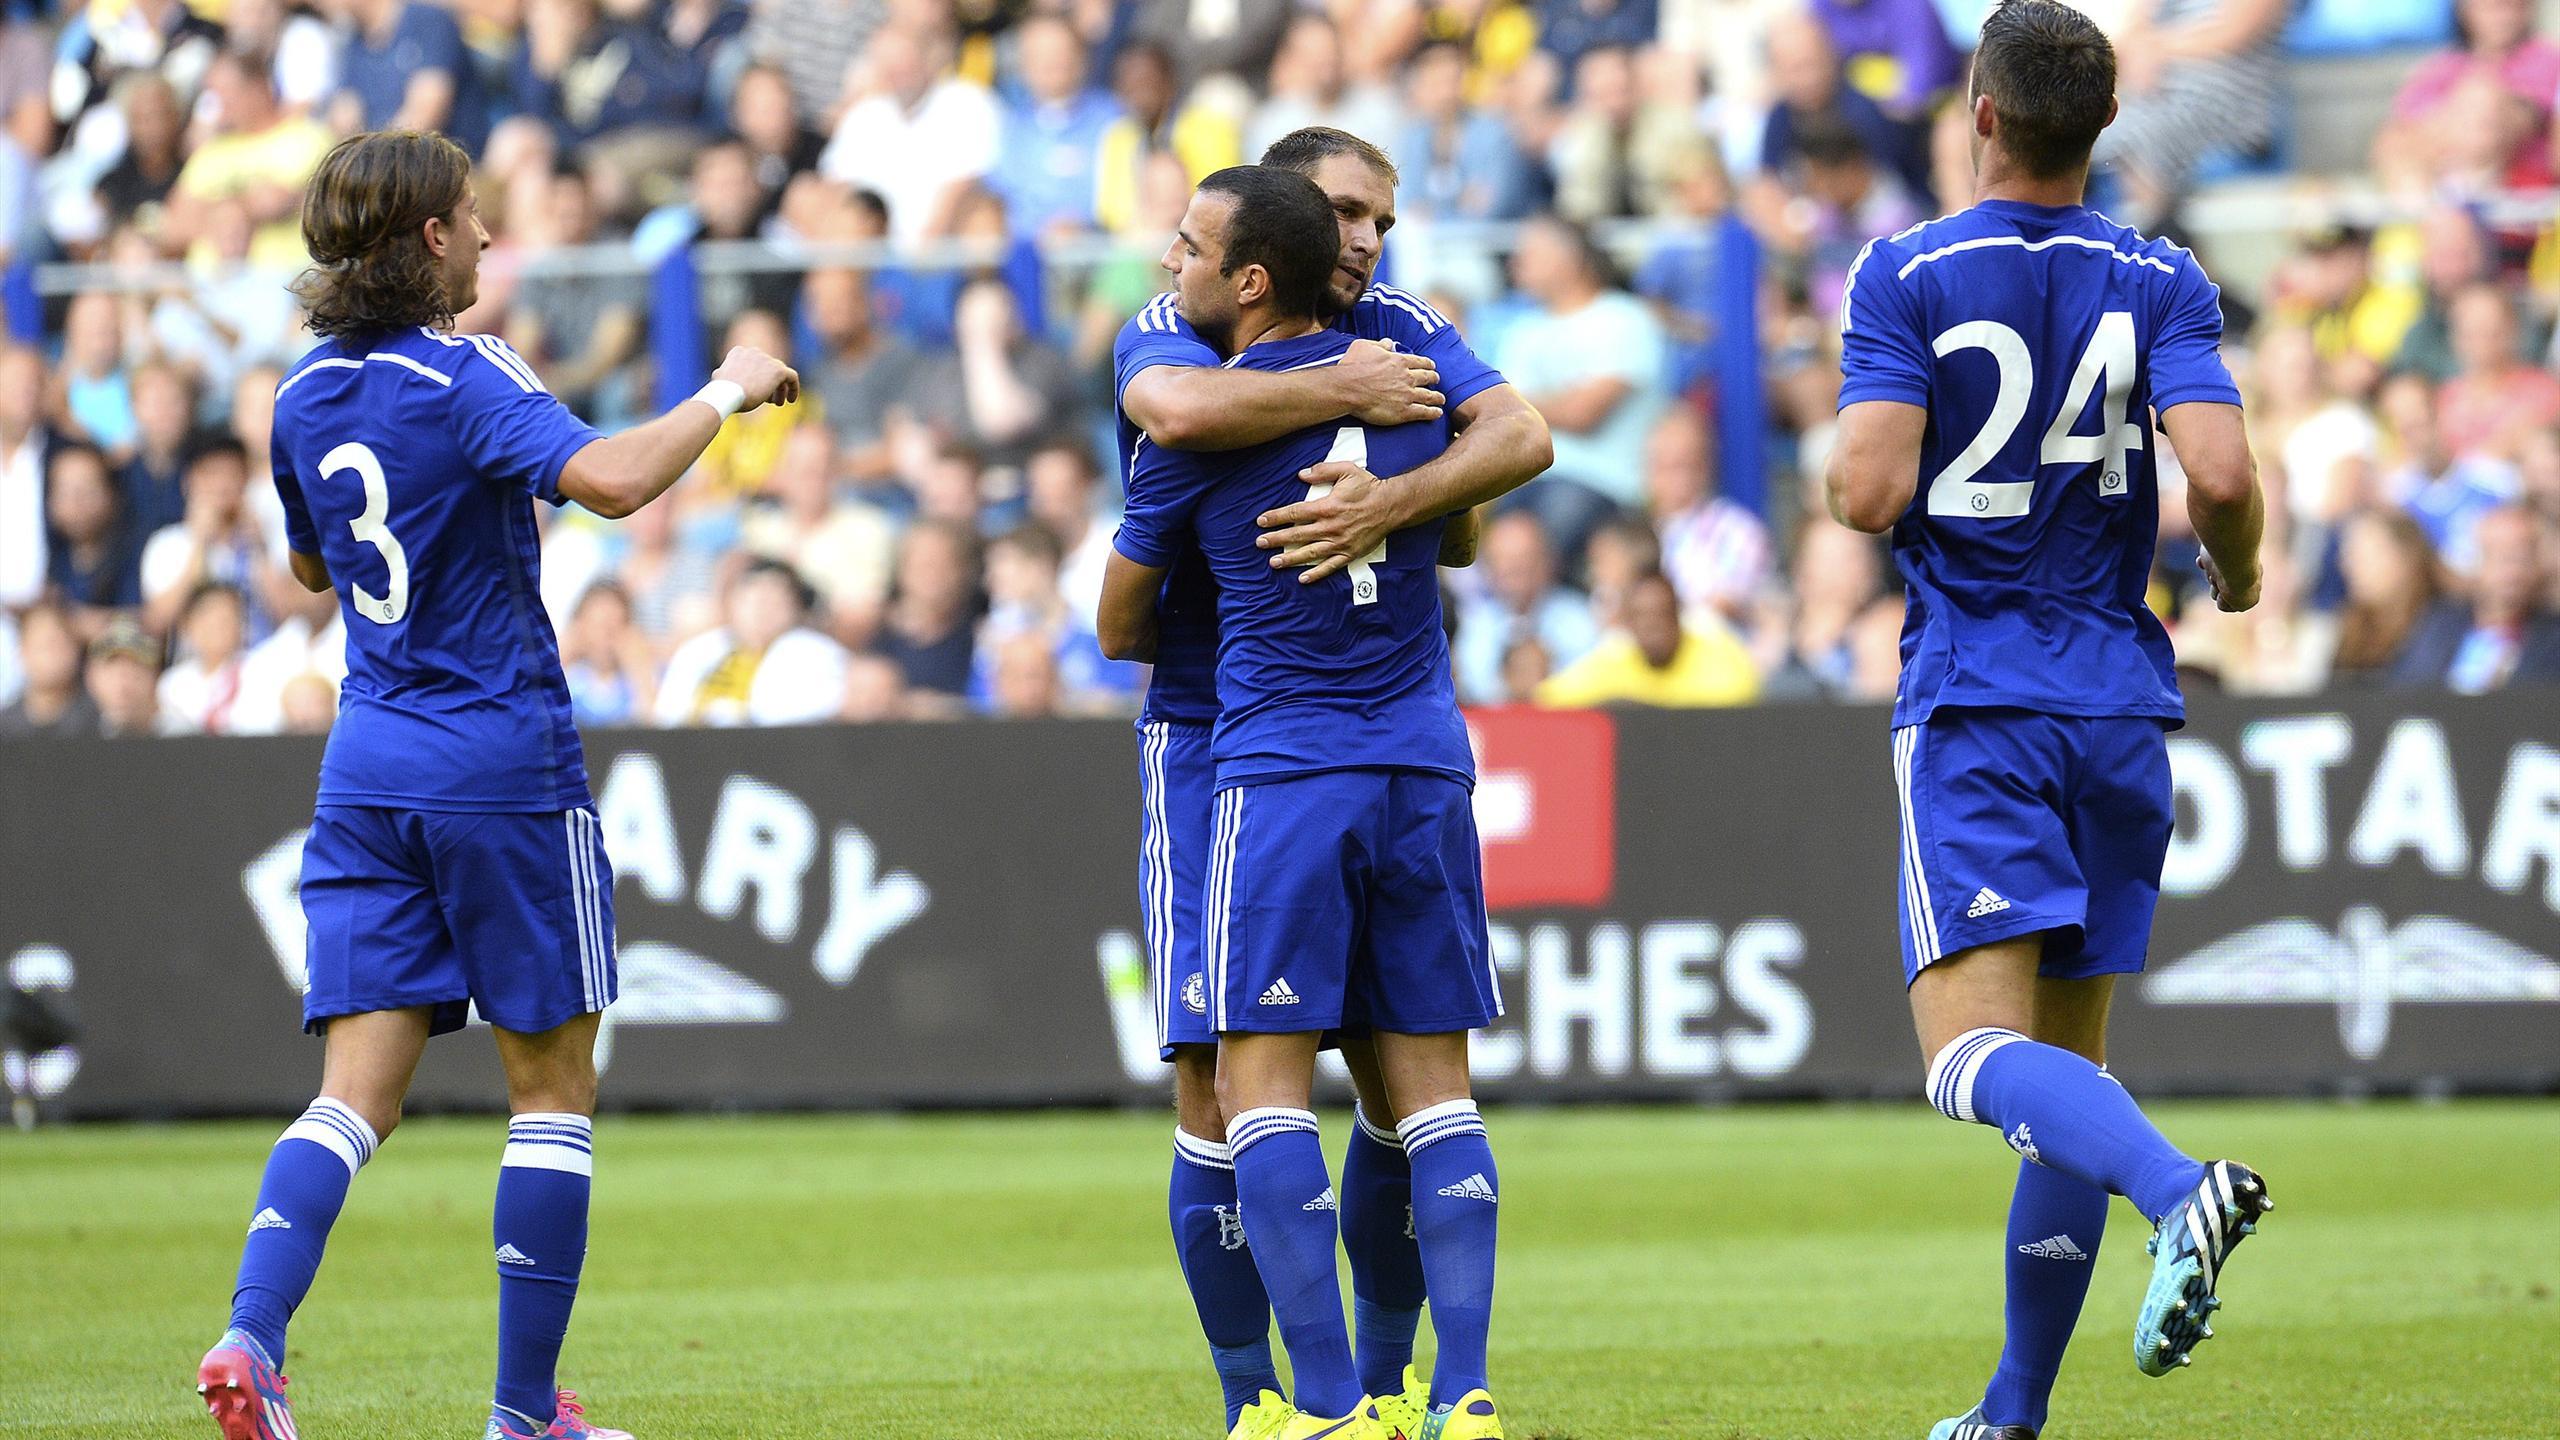 Friendly match - Fabregas impresses as Chelsea ease past Vitesse